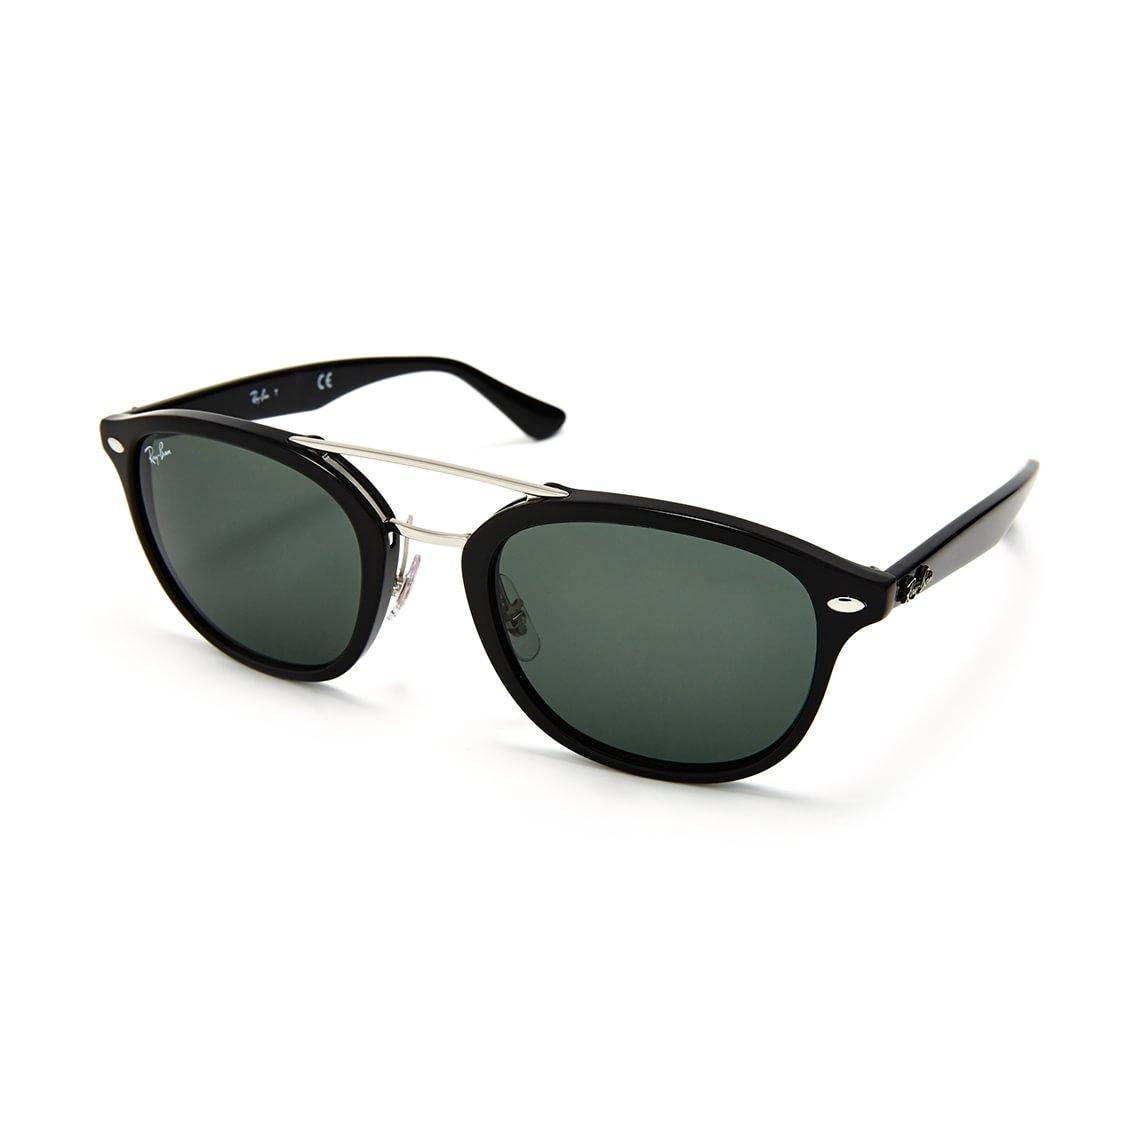 ray ban solbriller herre